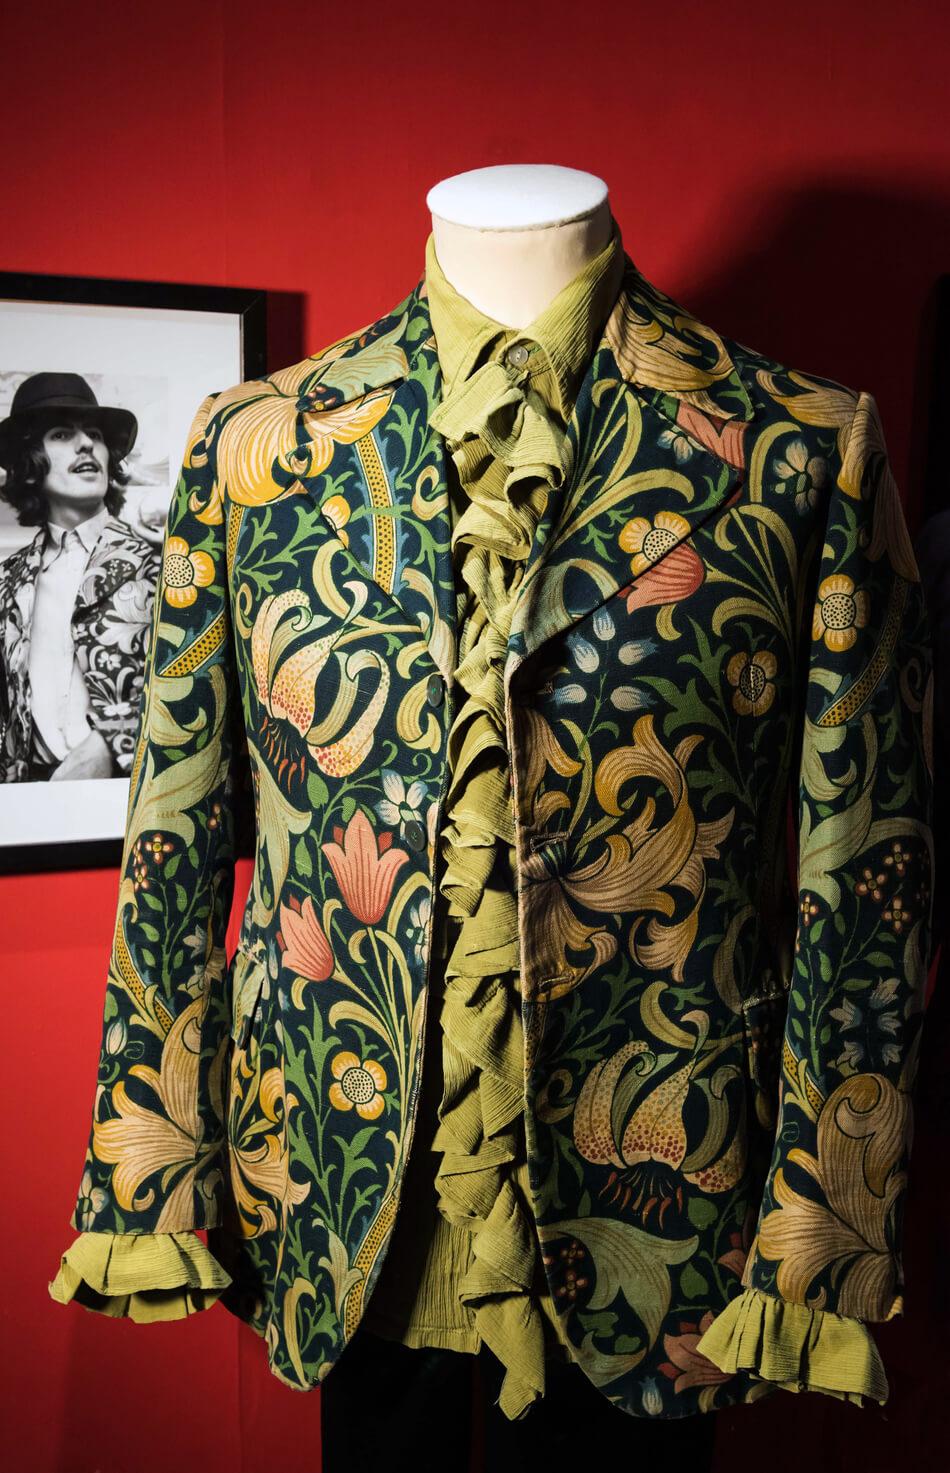 Beatifulpeople Fashiontexilemuseum 003